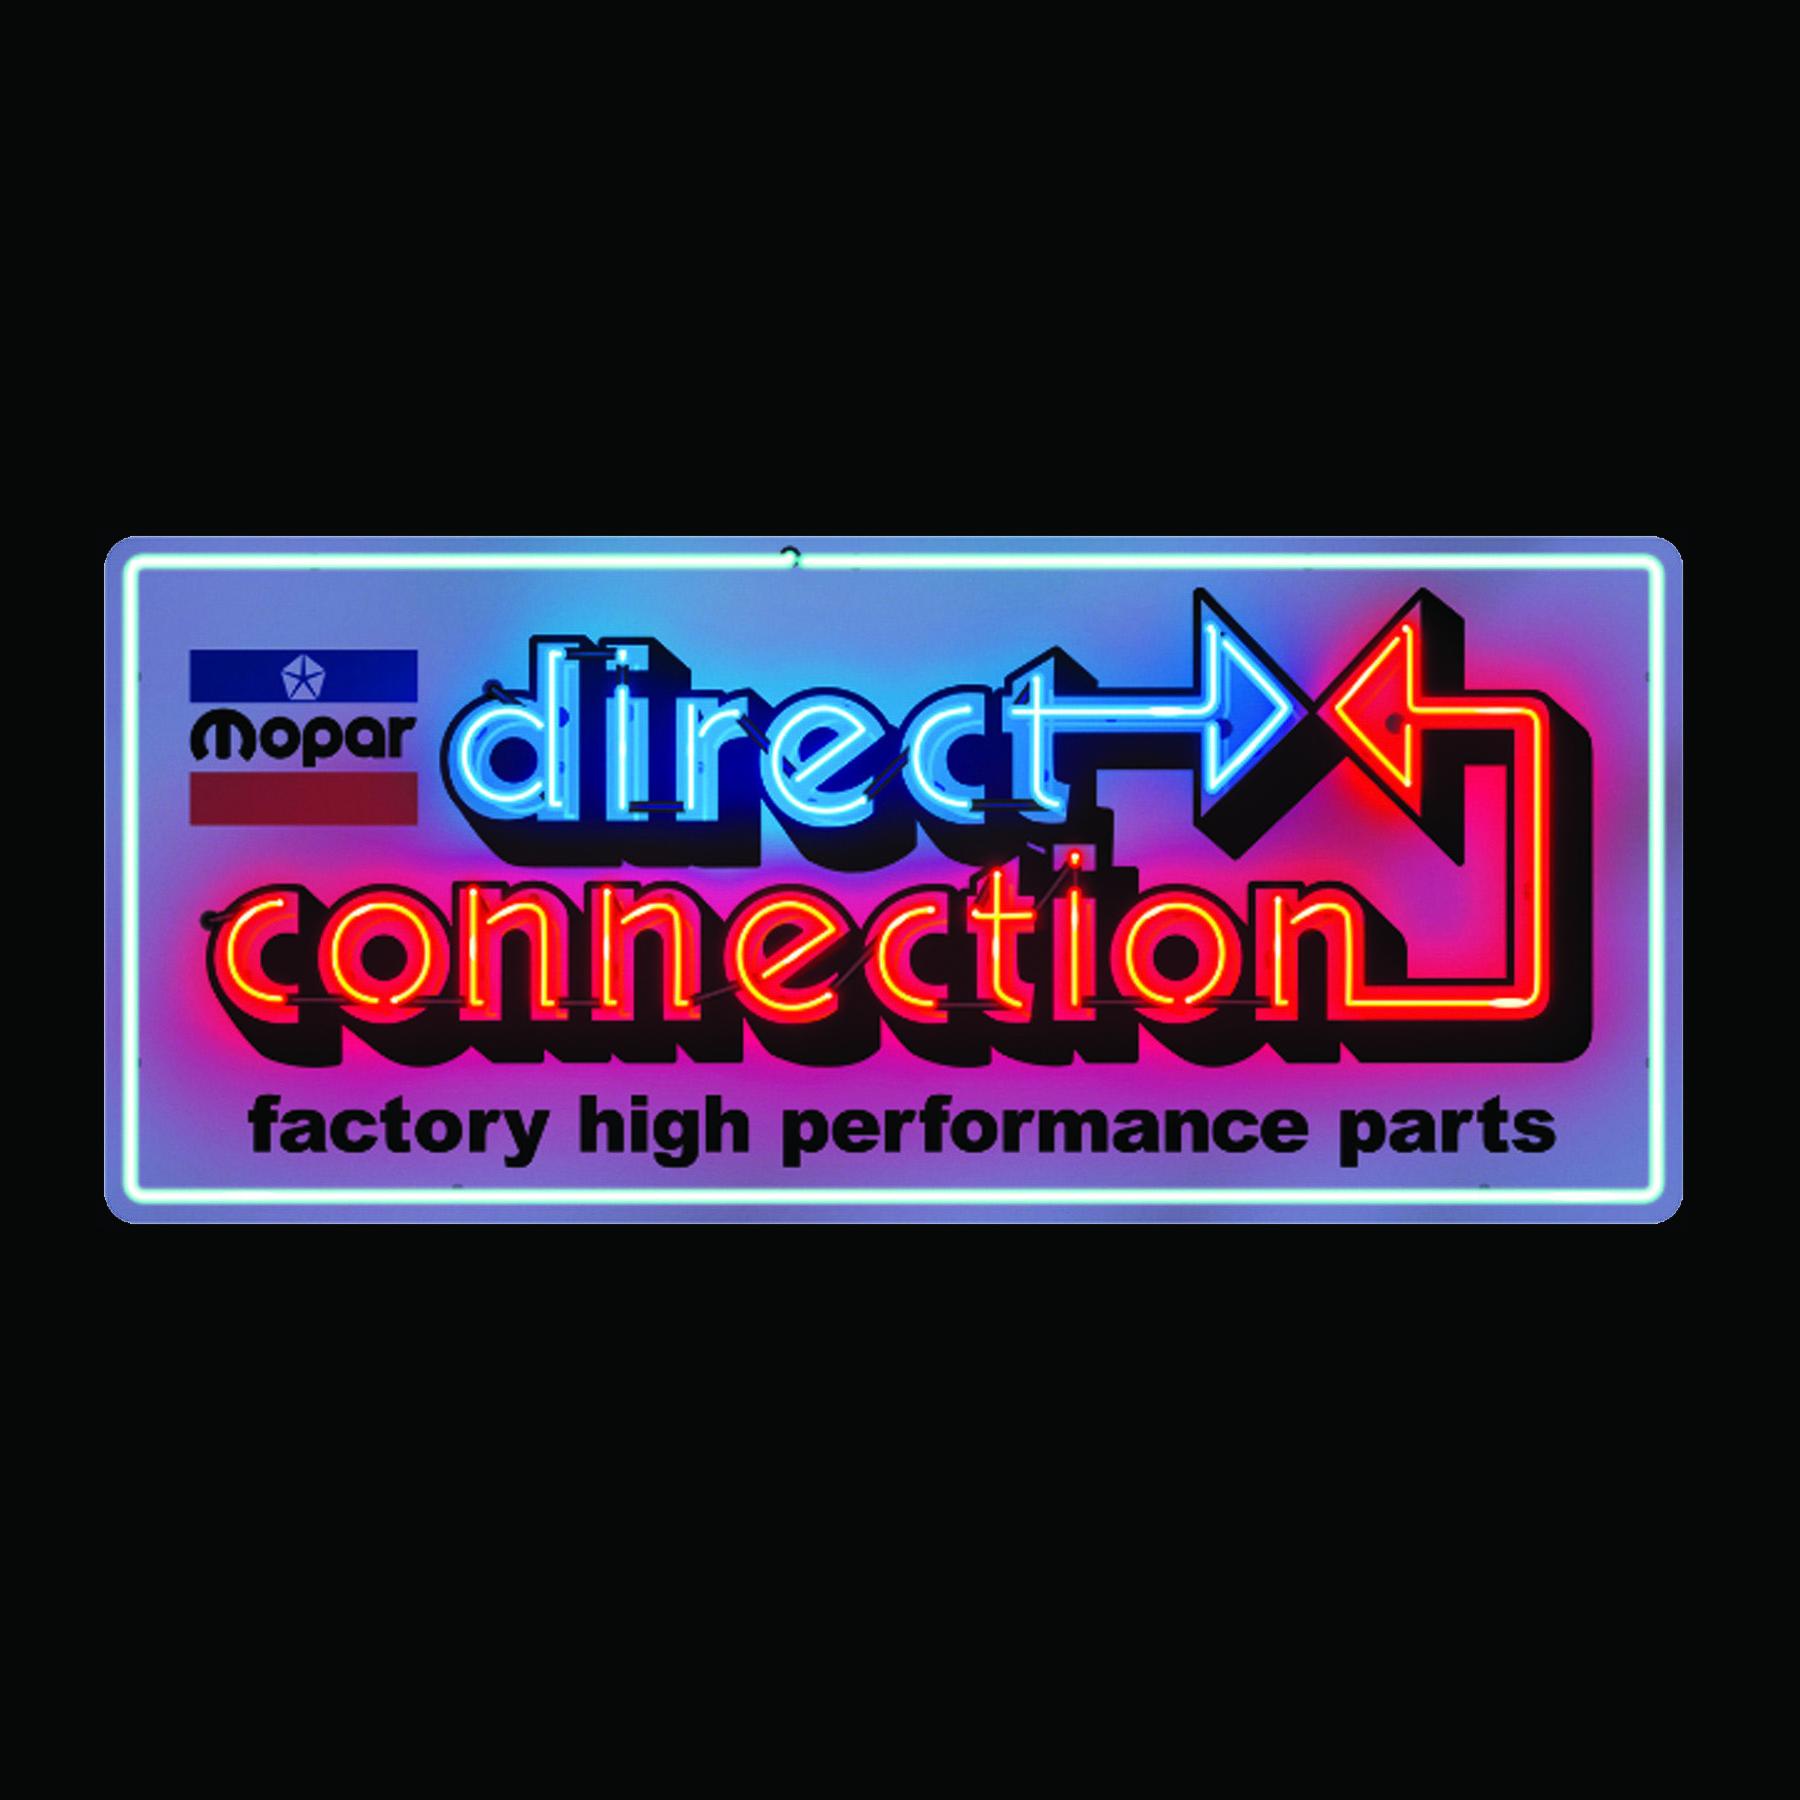 Merch Garage Art Dc Neon Metal Garage Art Sign